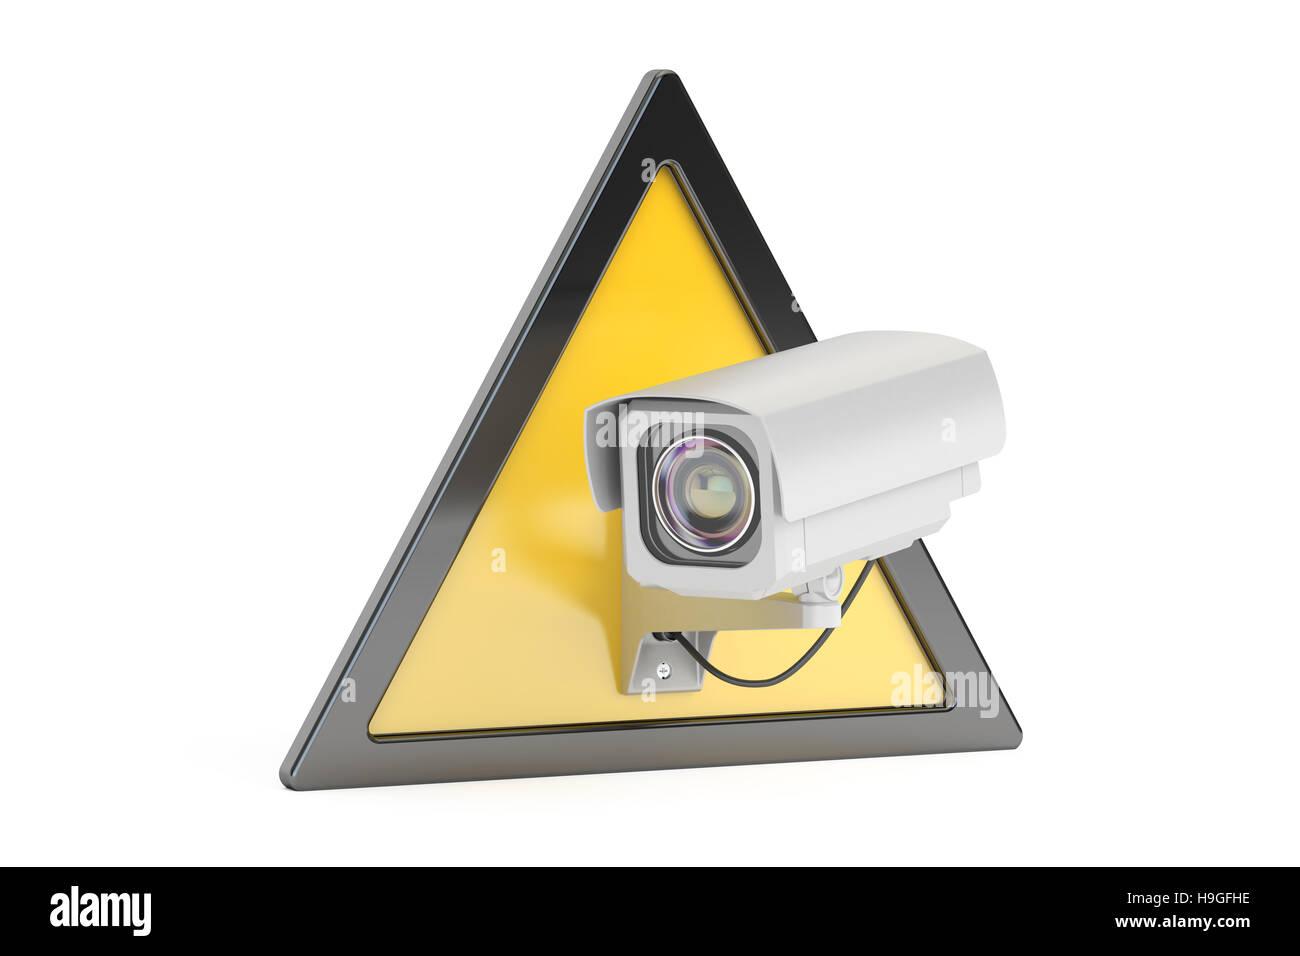 cctv kamera video berwachung schilder 3d rendering stockfoto bild 126367962 alamy. Black Bedroom Furniture Sets. Home Design Ideas